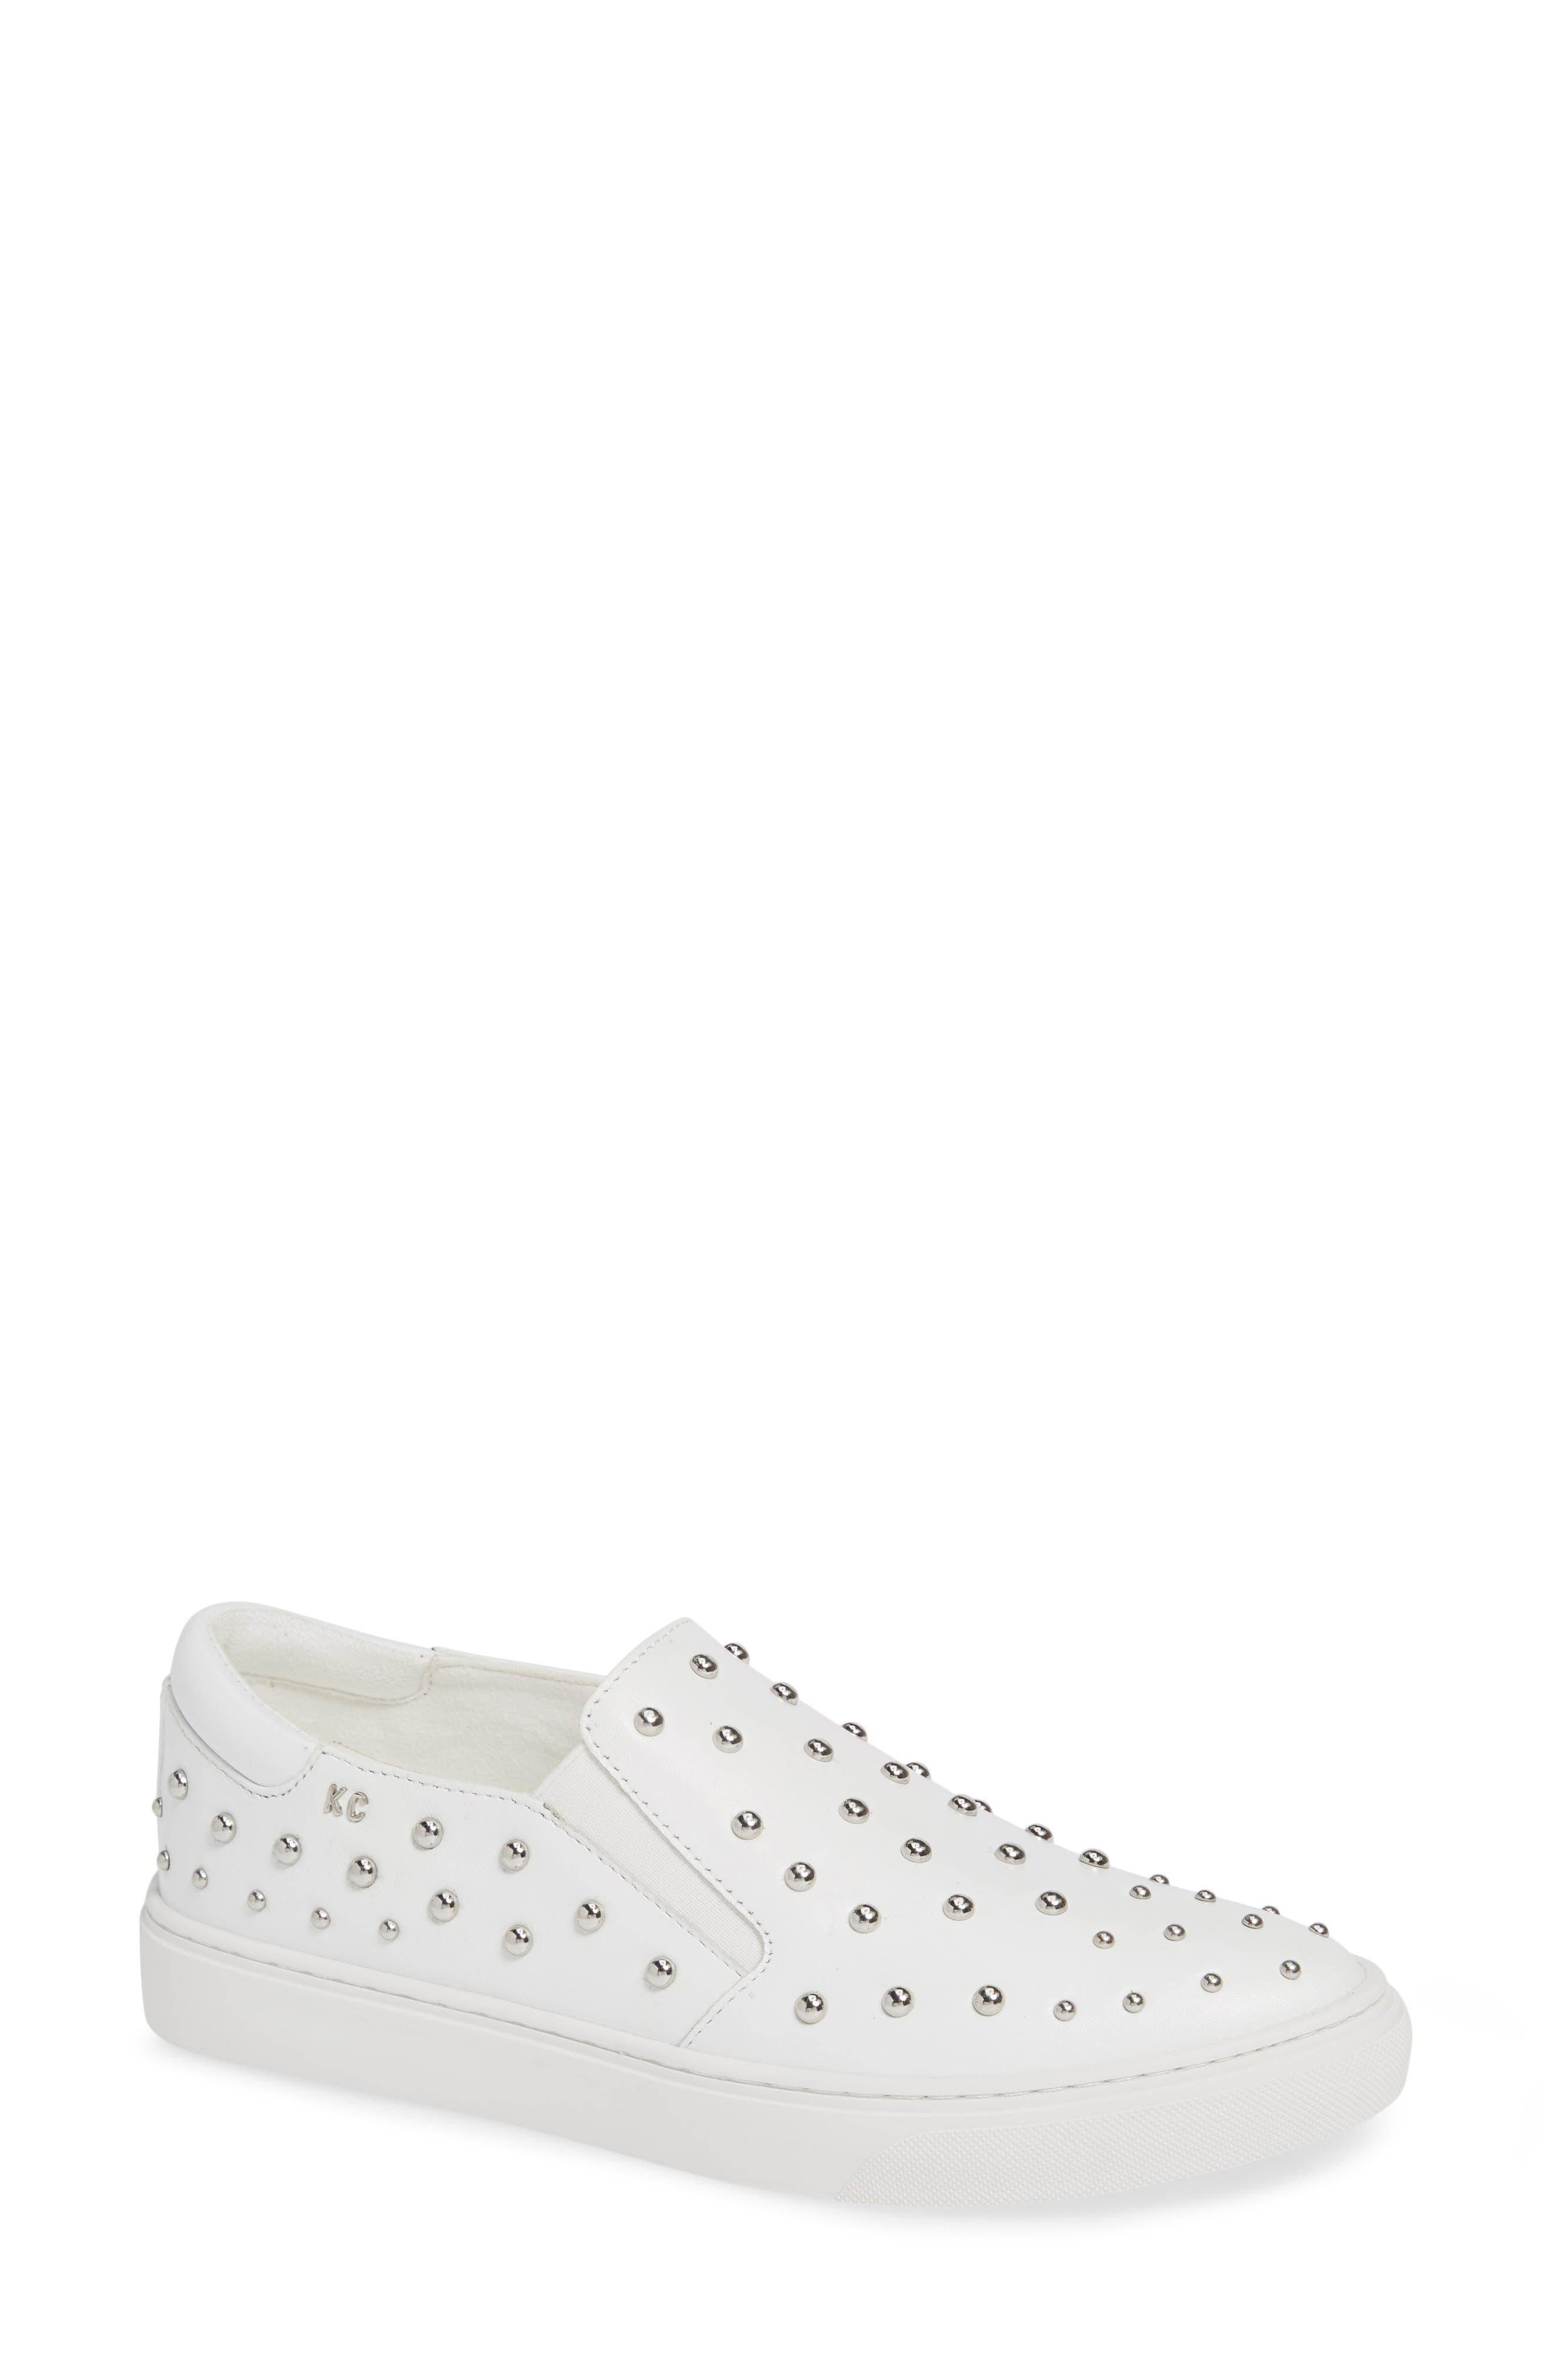 Mara Stud Slip-On Sneaker, Main, color, WHITE LEATHER